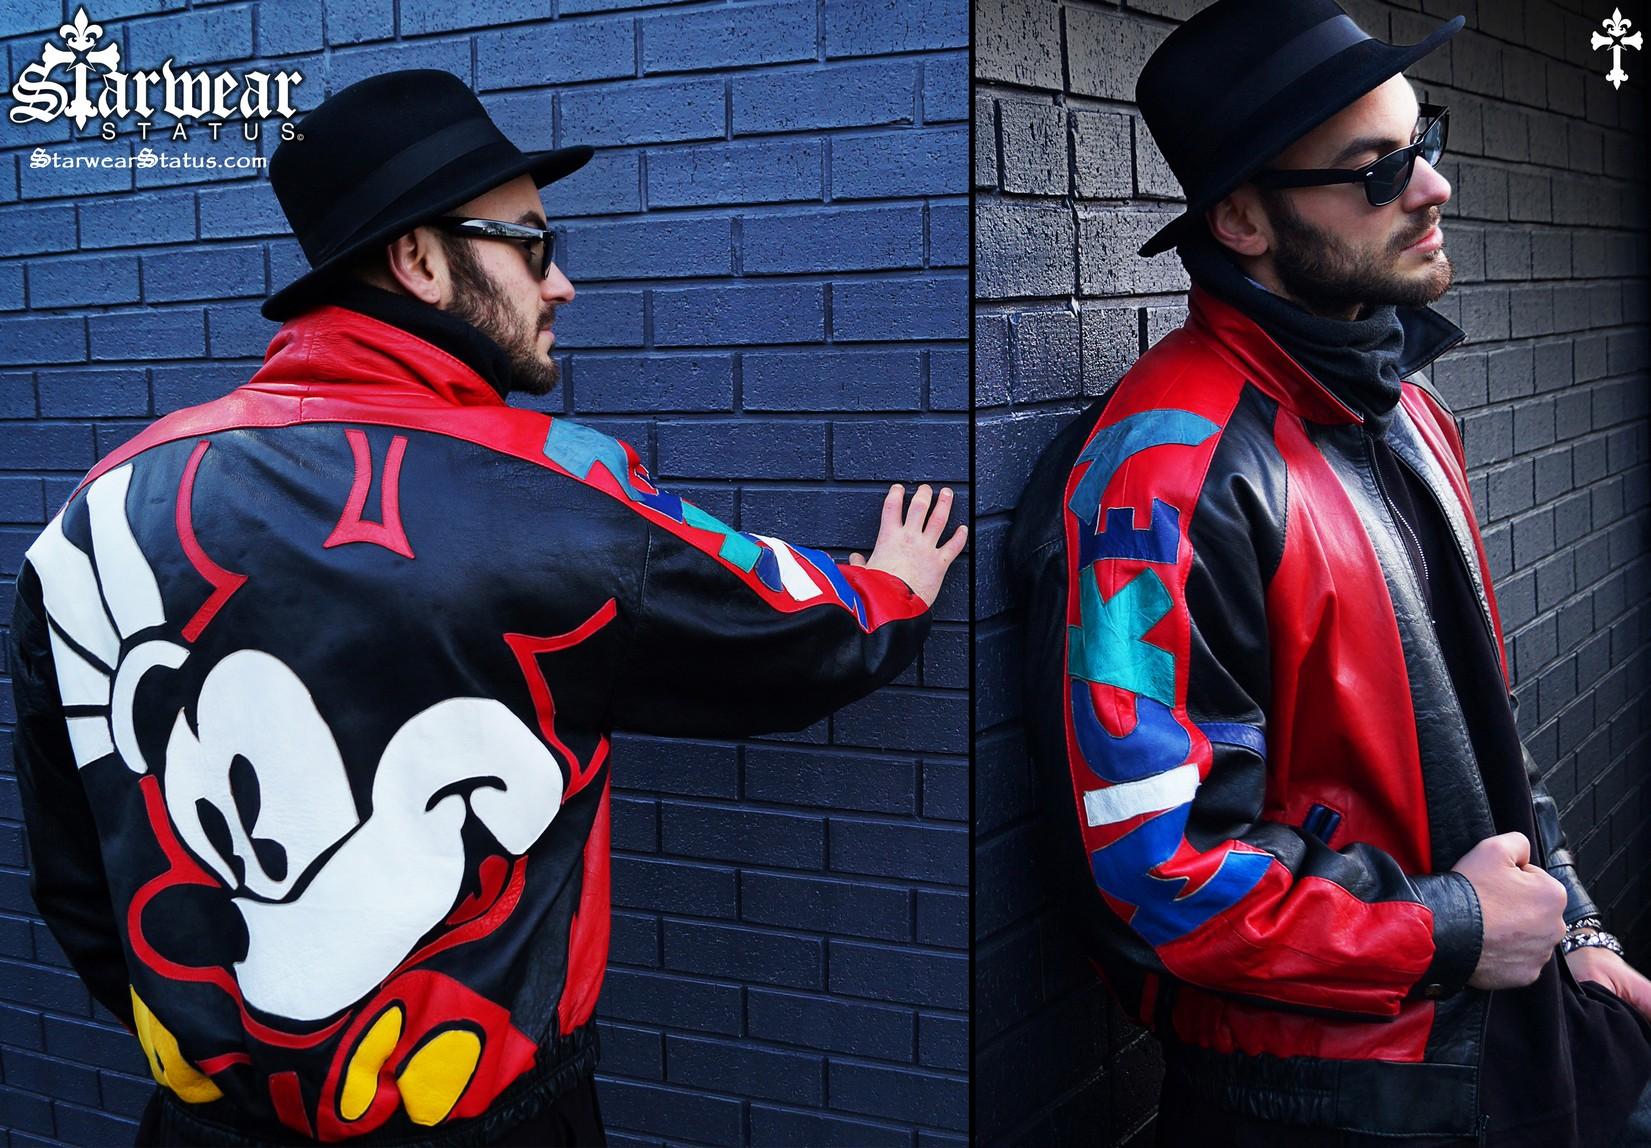 e3dc1a91601 90's Vintage Disney Mickey Mouse Leather Bomber Jacket Size Medium/Large  (Chris Brown Worn Wardrobe Piece!)